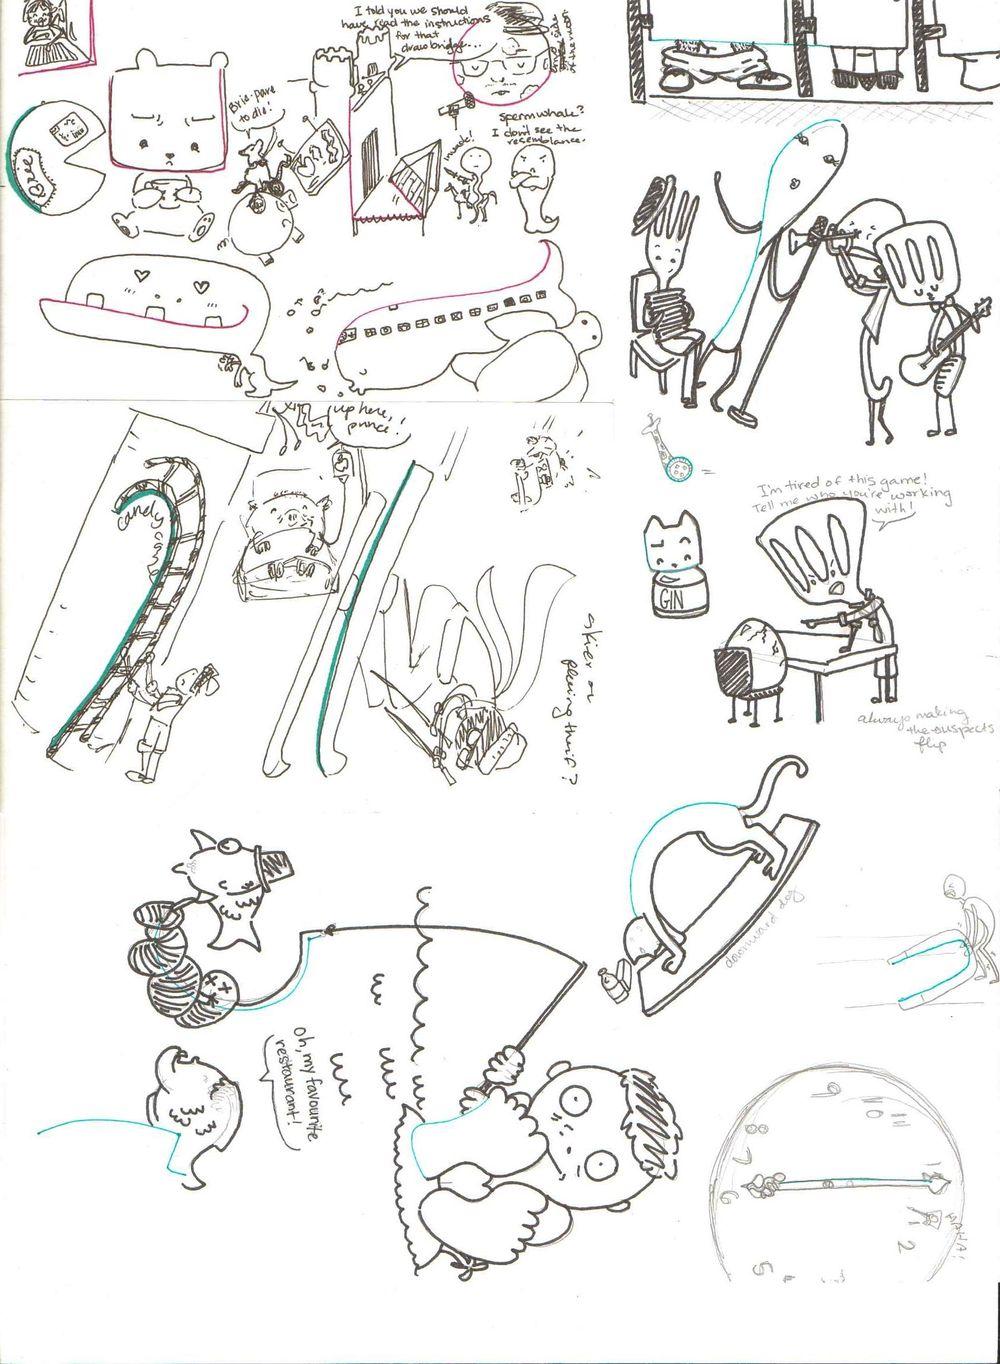 Doodlesheet - image 1 - student project